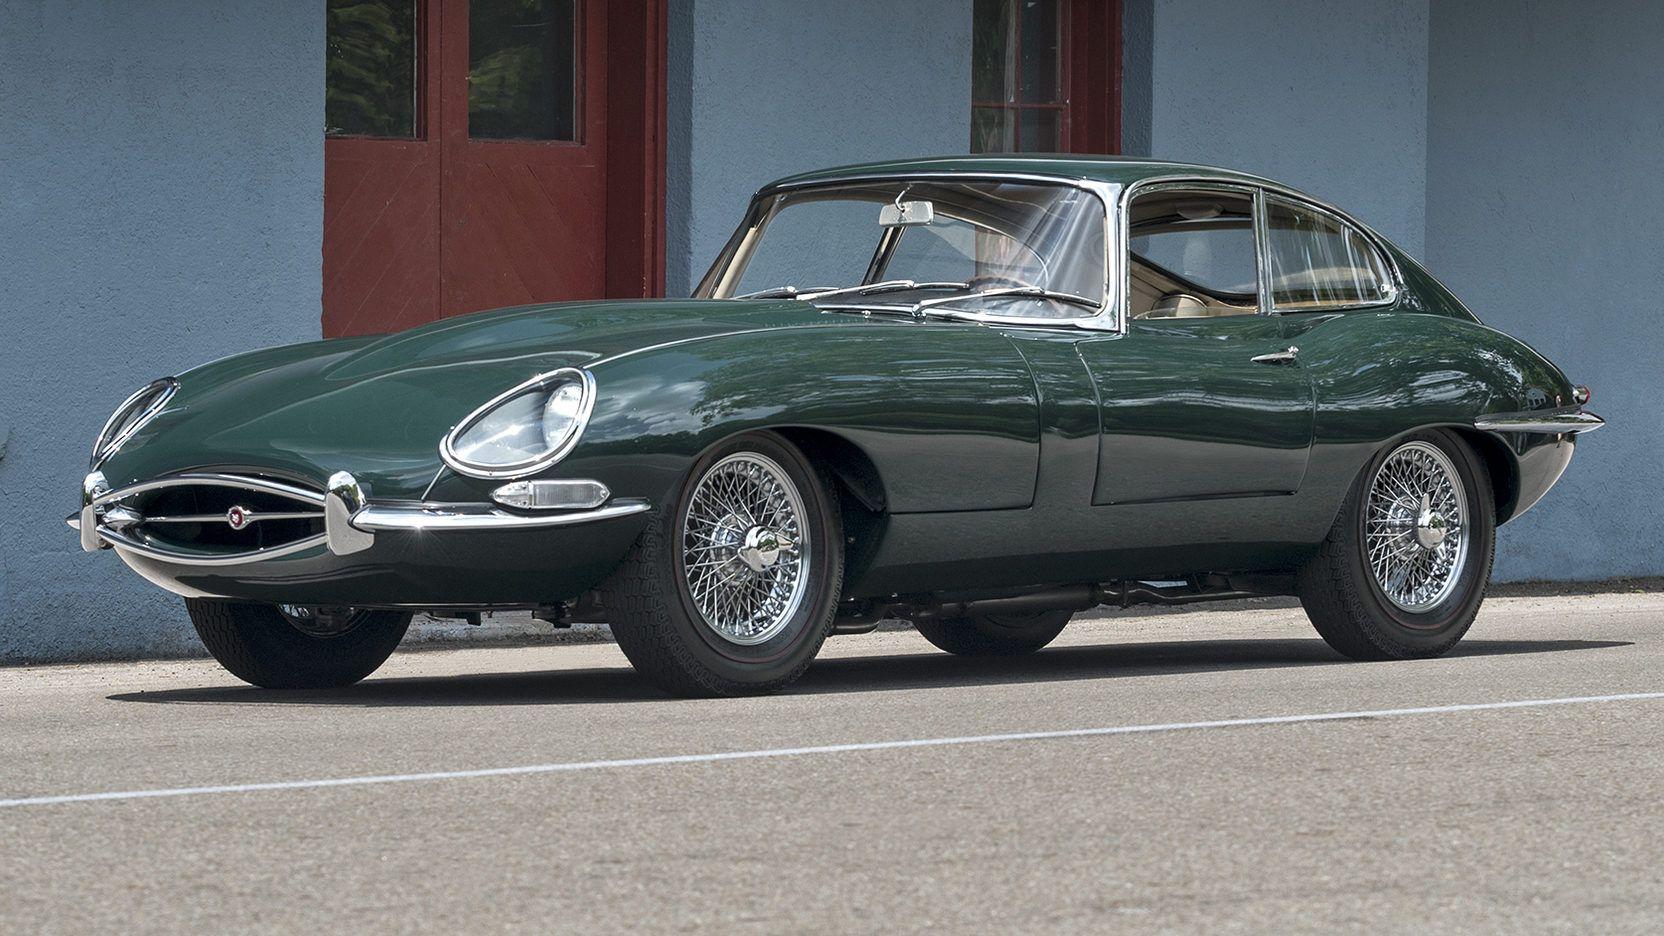 1967 Jaguar E Type Series 1 Fixed Head Coupe Presented As Lot F61 At Monterey Ca Jaguar E Type Jaguar Car Jaguar